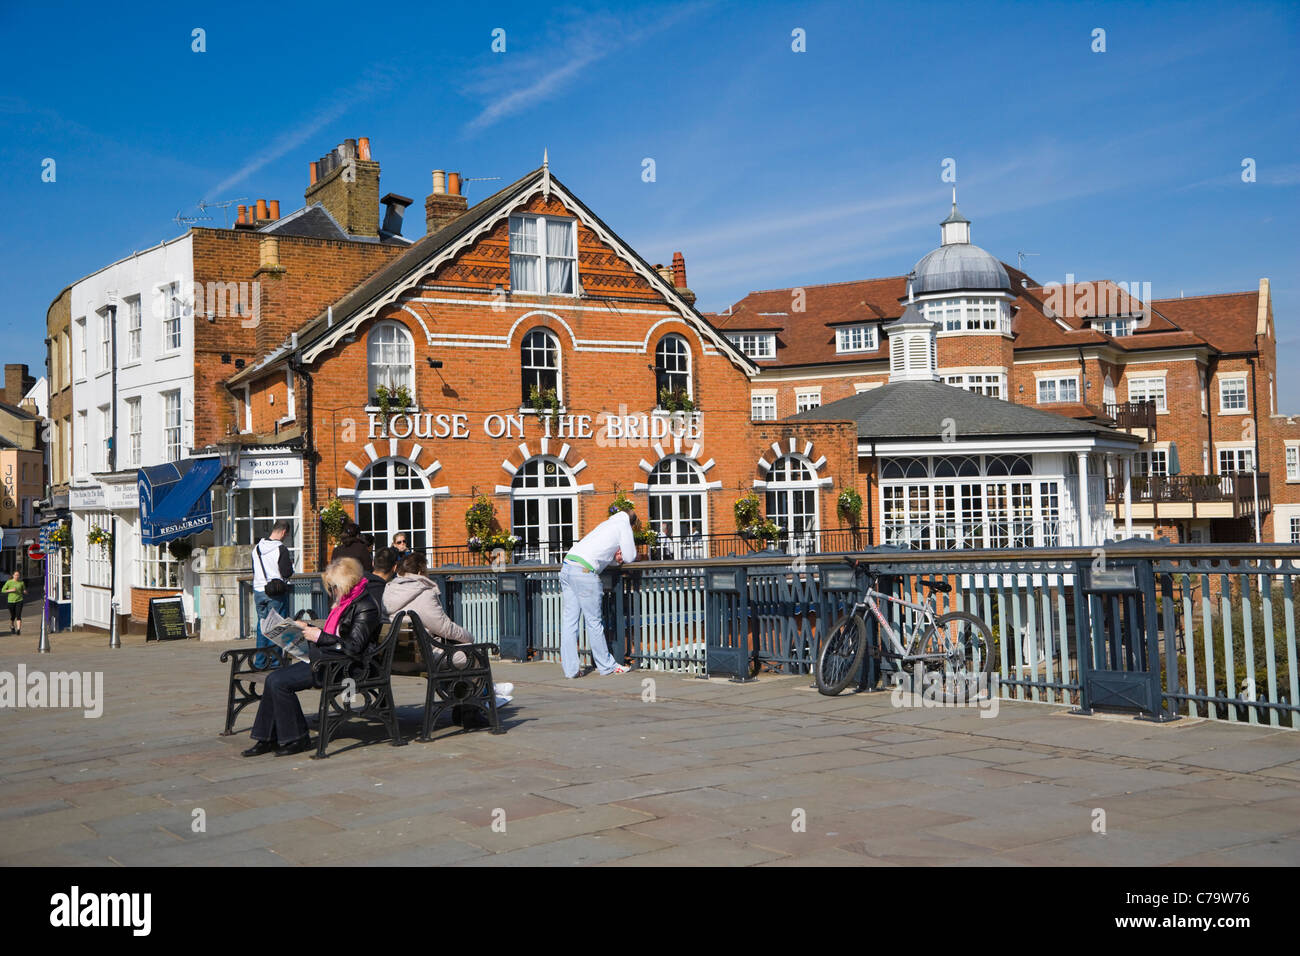 House on the Bridge Riverside Restaurant by the river Thames, Winsor Bridge, Eton, Berksire, England, UK Stock Photo